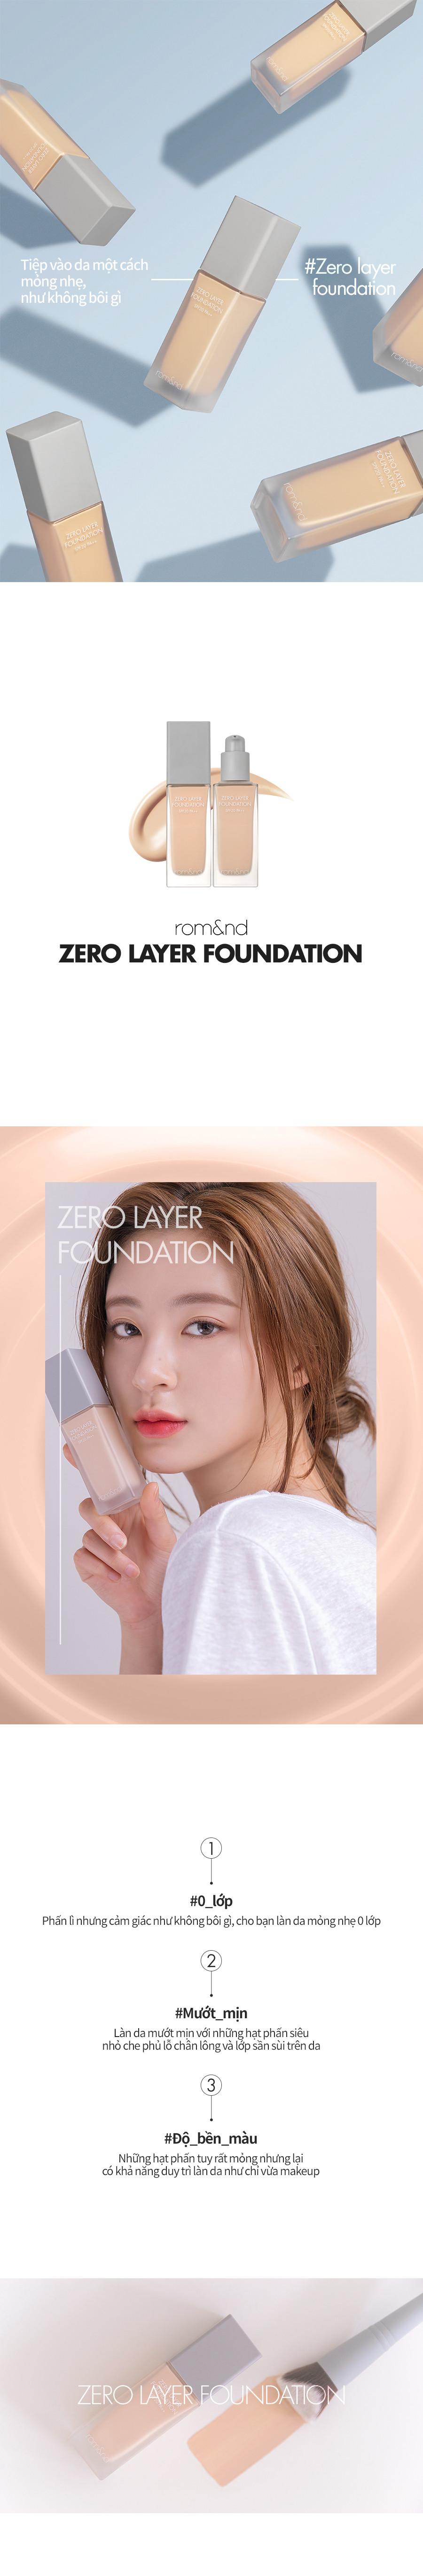 ZERO_LAYER_FOUNDATION1-1.jpg